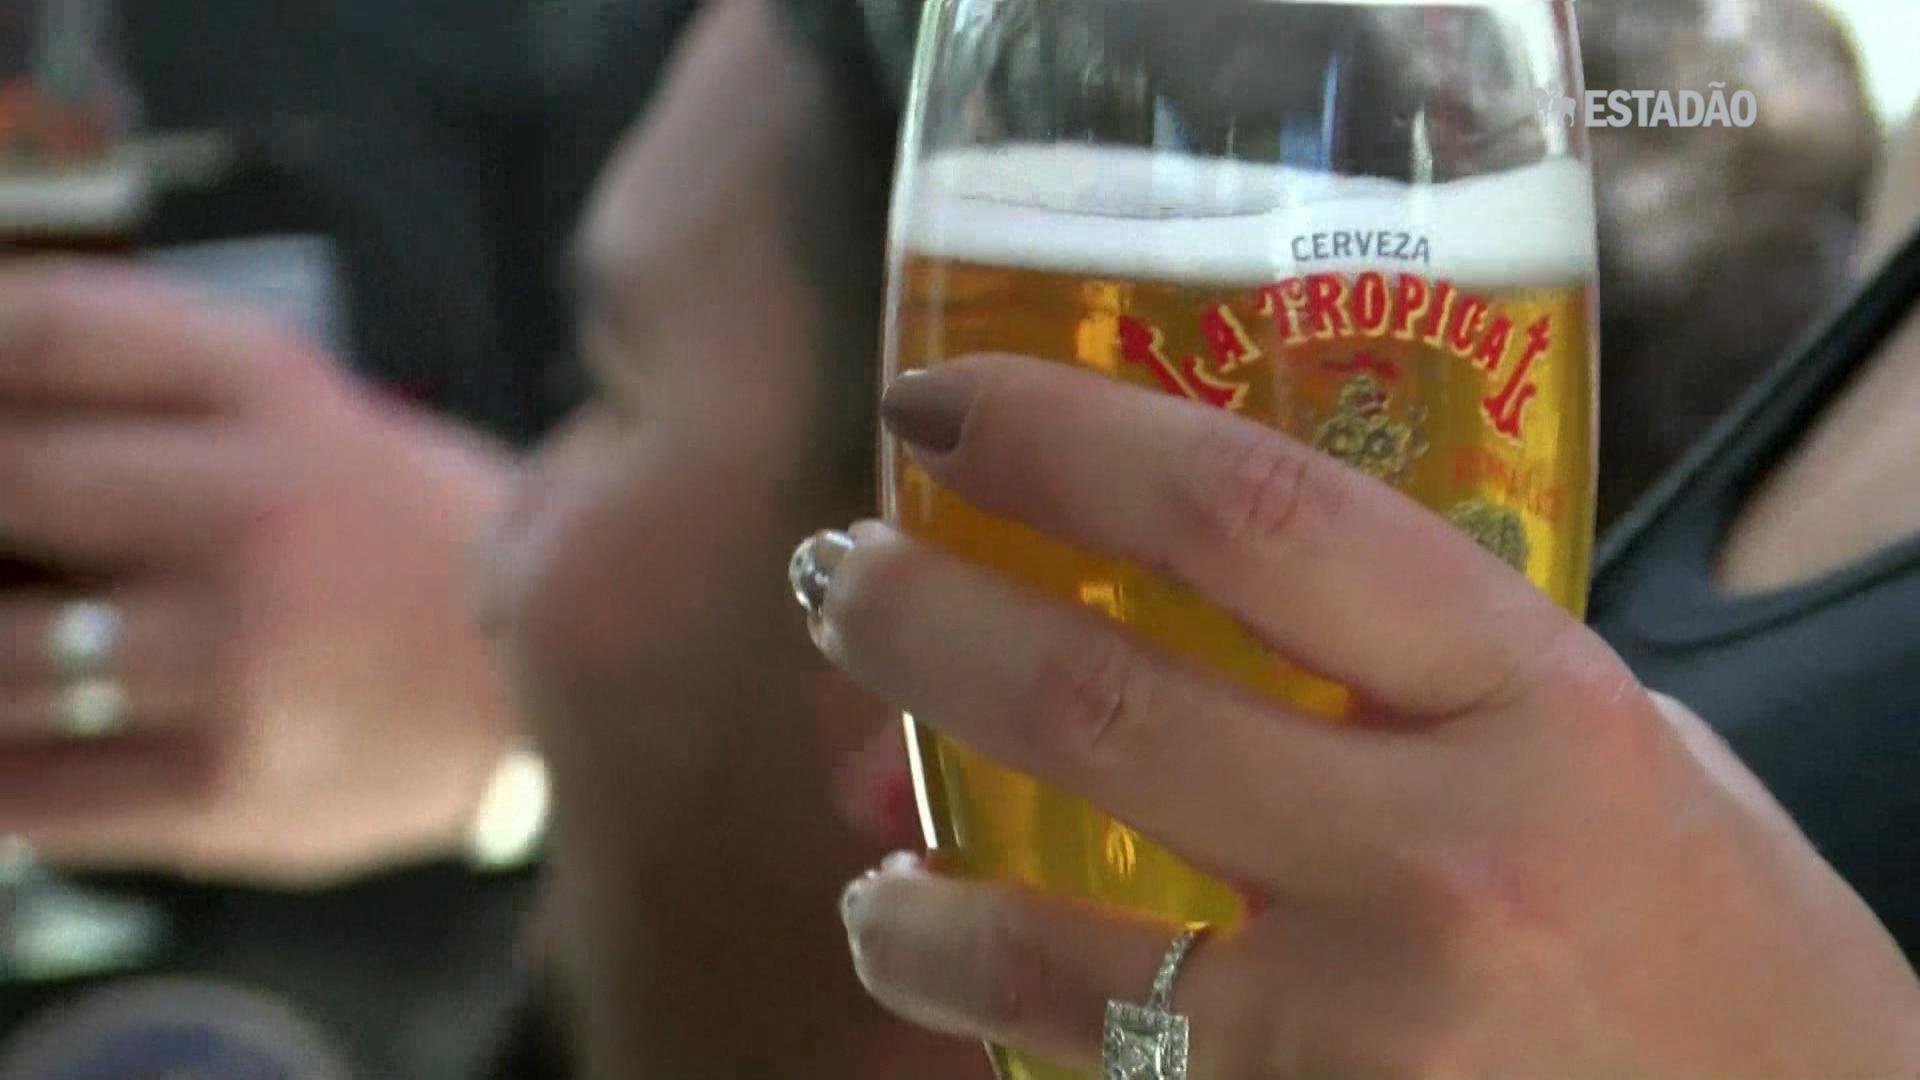 La Tropical, a cerveja mais antiga de Cuba volta a ser vendida nos EUA